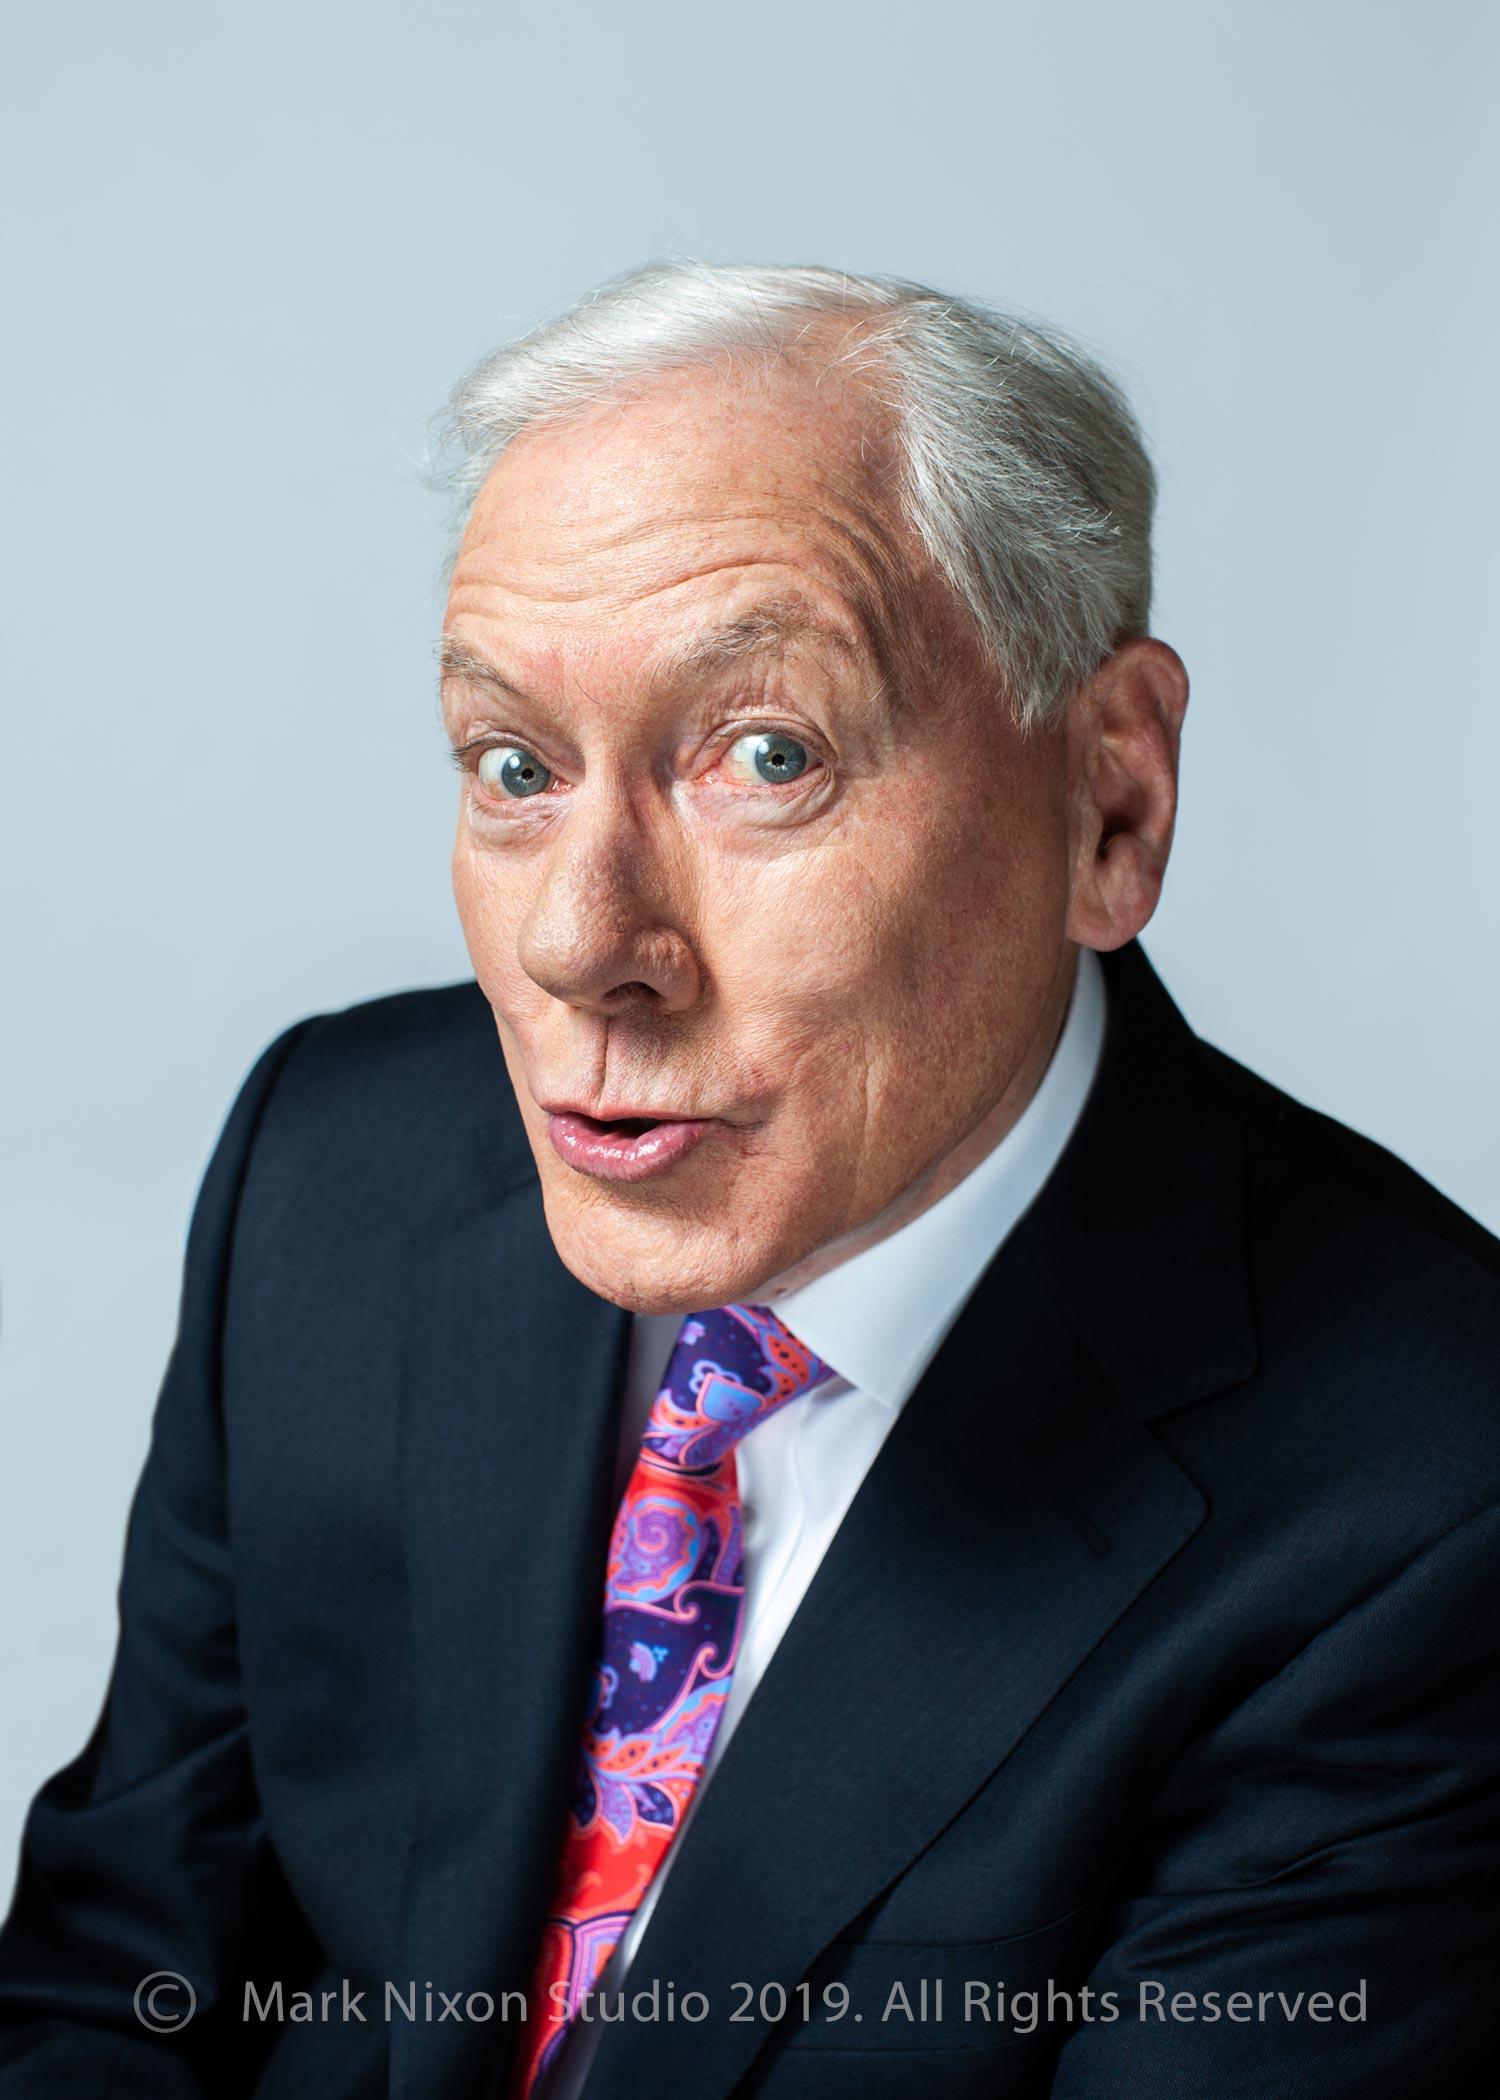 Gay-Byrne-Funny-Face-03.jpg